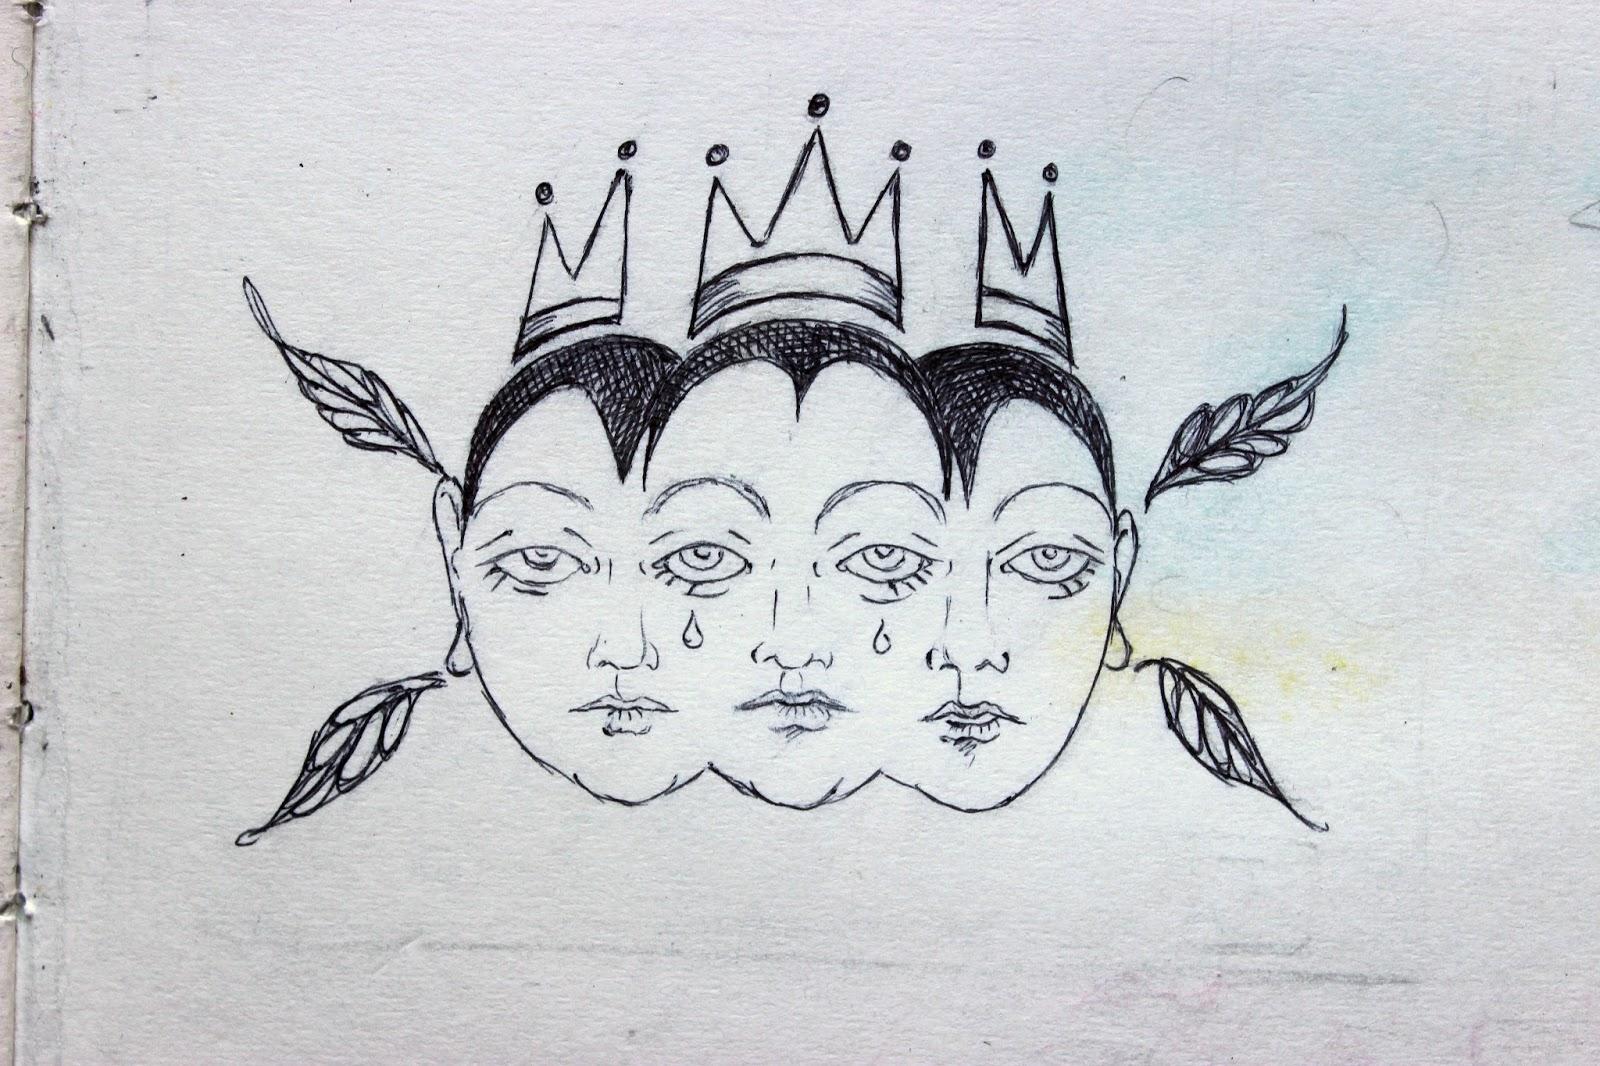 Sketchpad Notebook Sketch Drawing Pencil Pen Three Queens Faces Crown